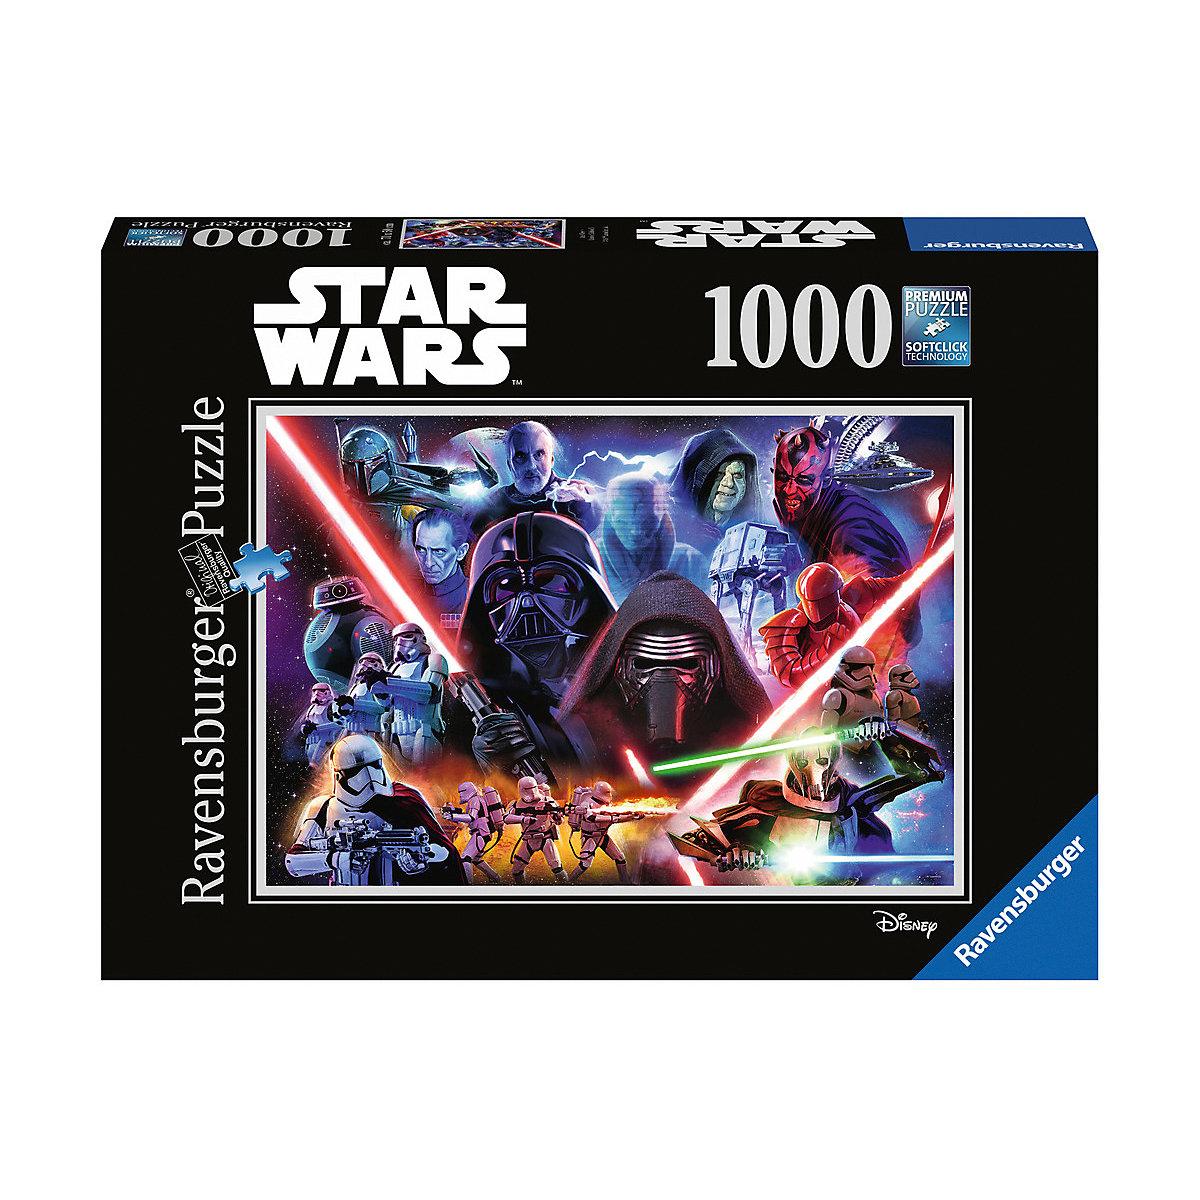 Star Wars Teile Reihenfolge